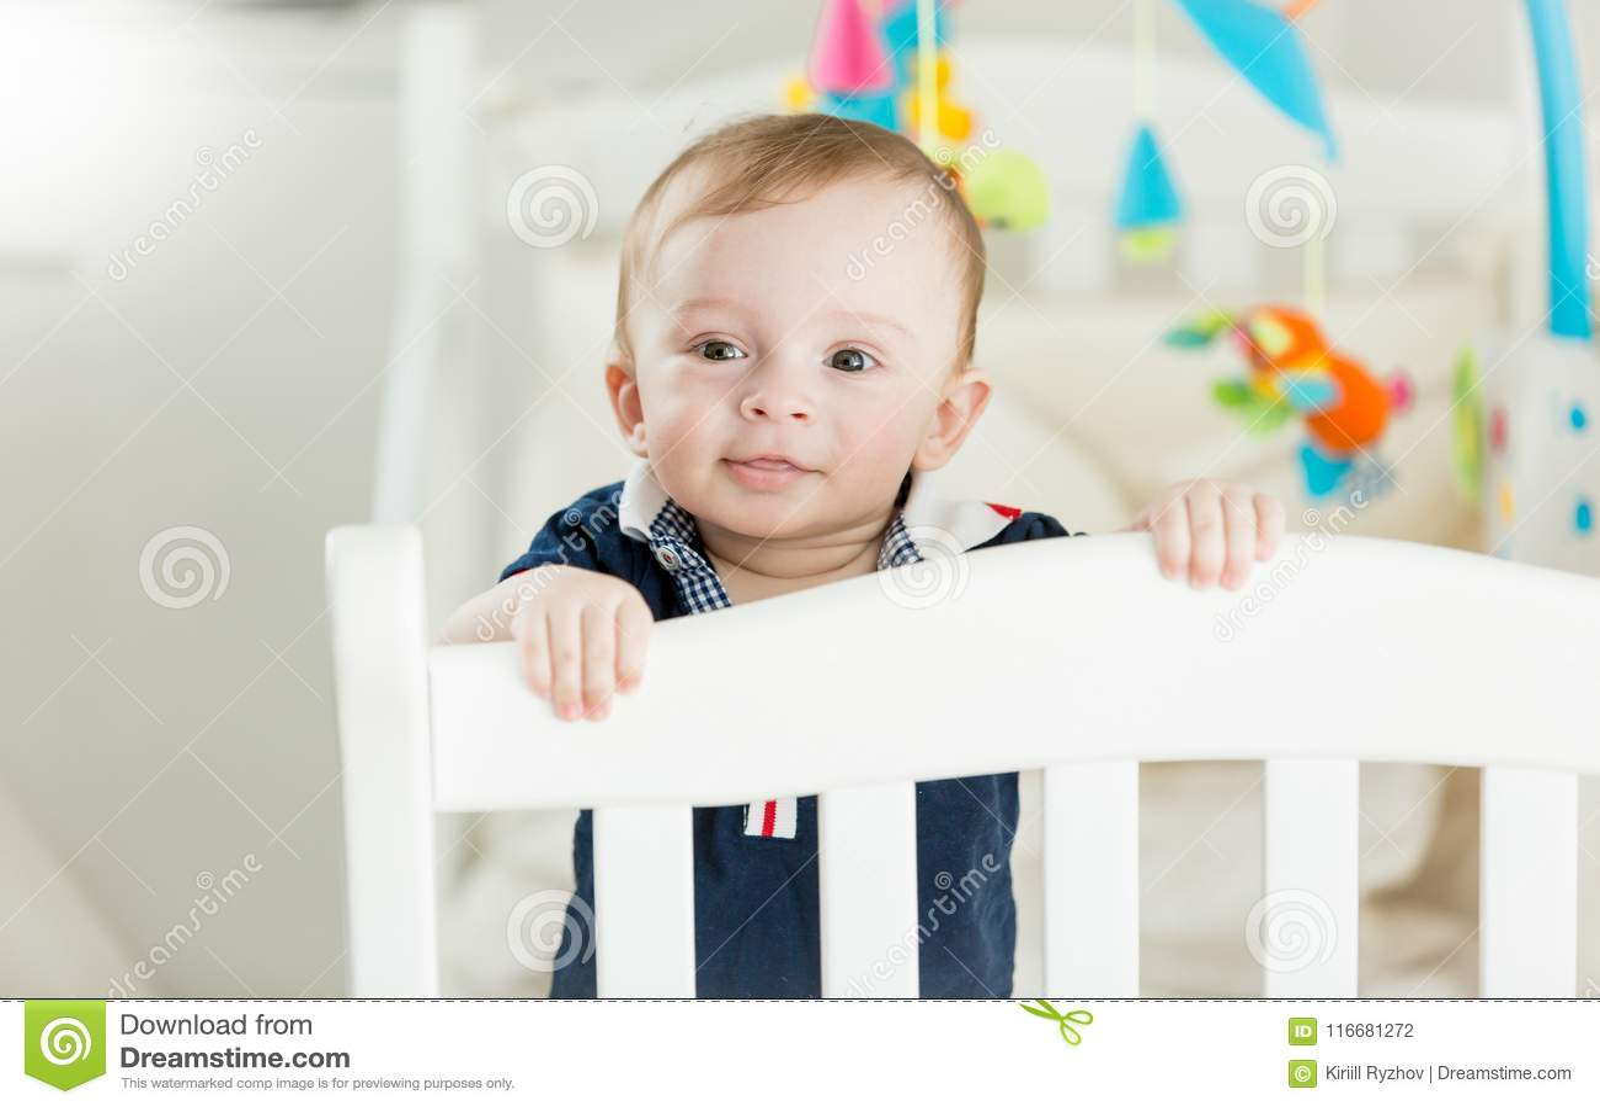 Portrait Of Cute Baby Boy Standing In White Wooden Crib ...